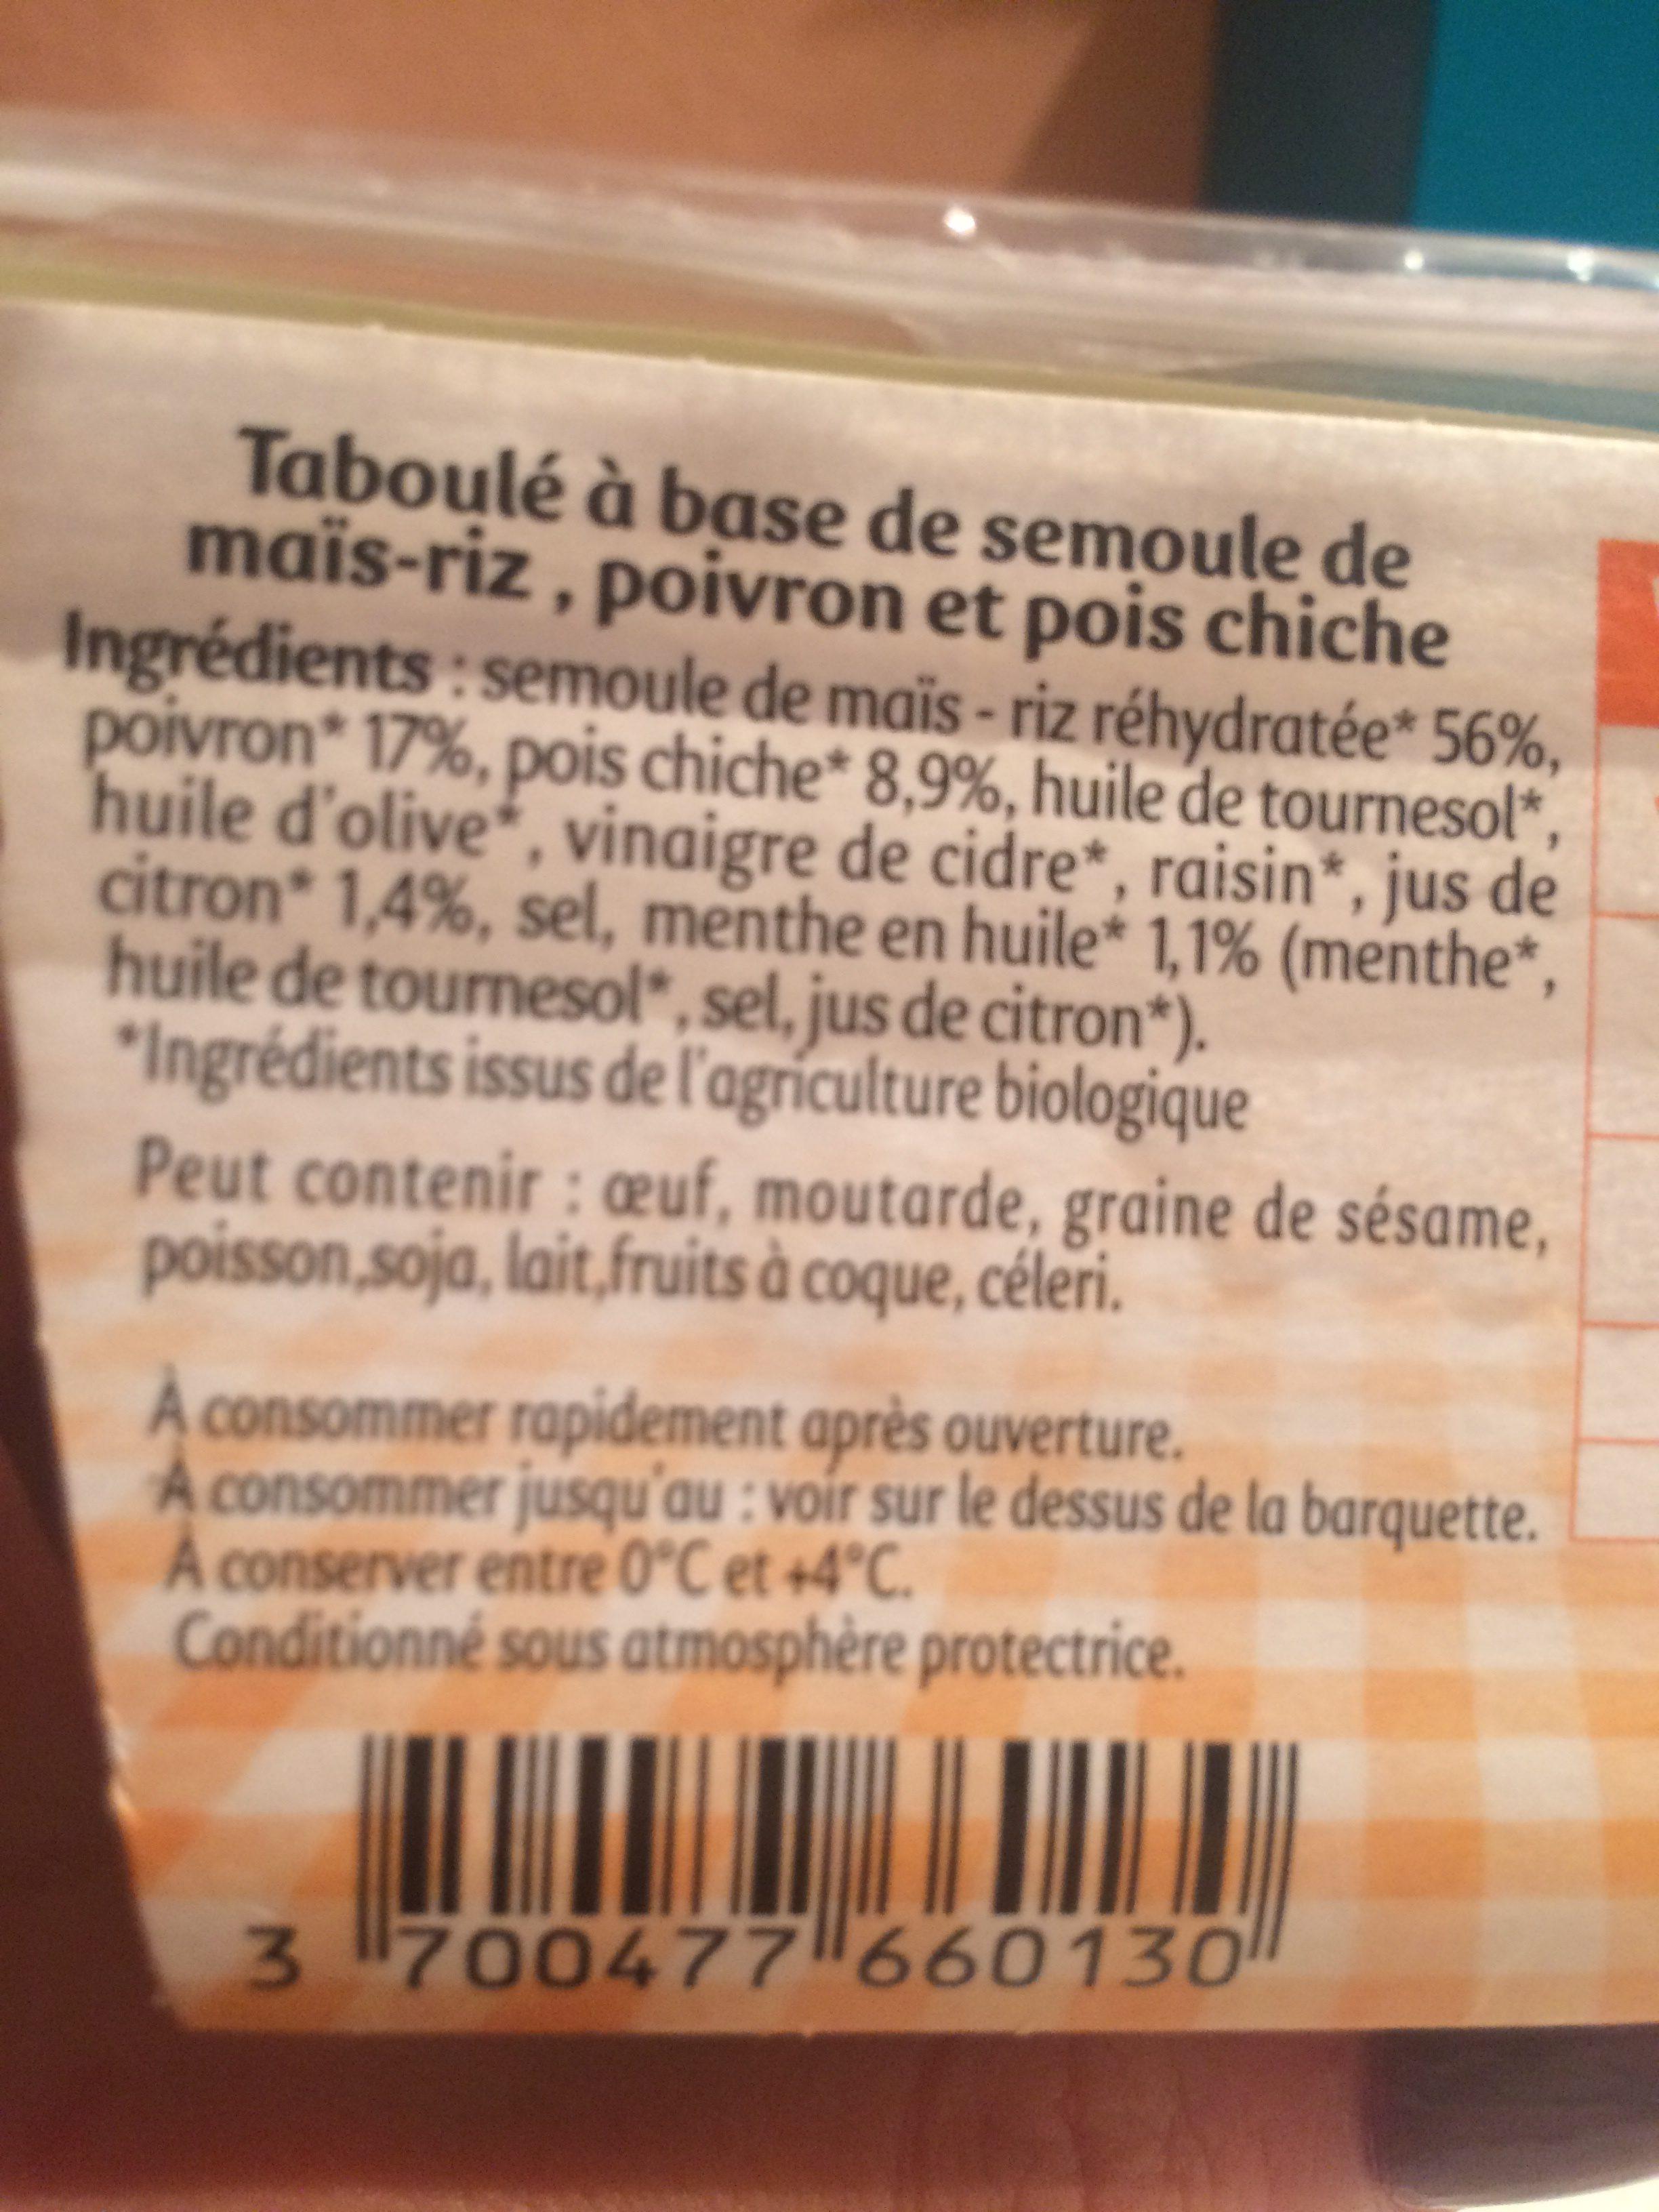 Salade repas taboulé doré semoule maïs riz - Ingredients